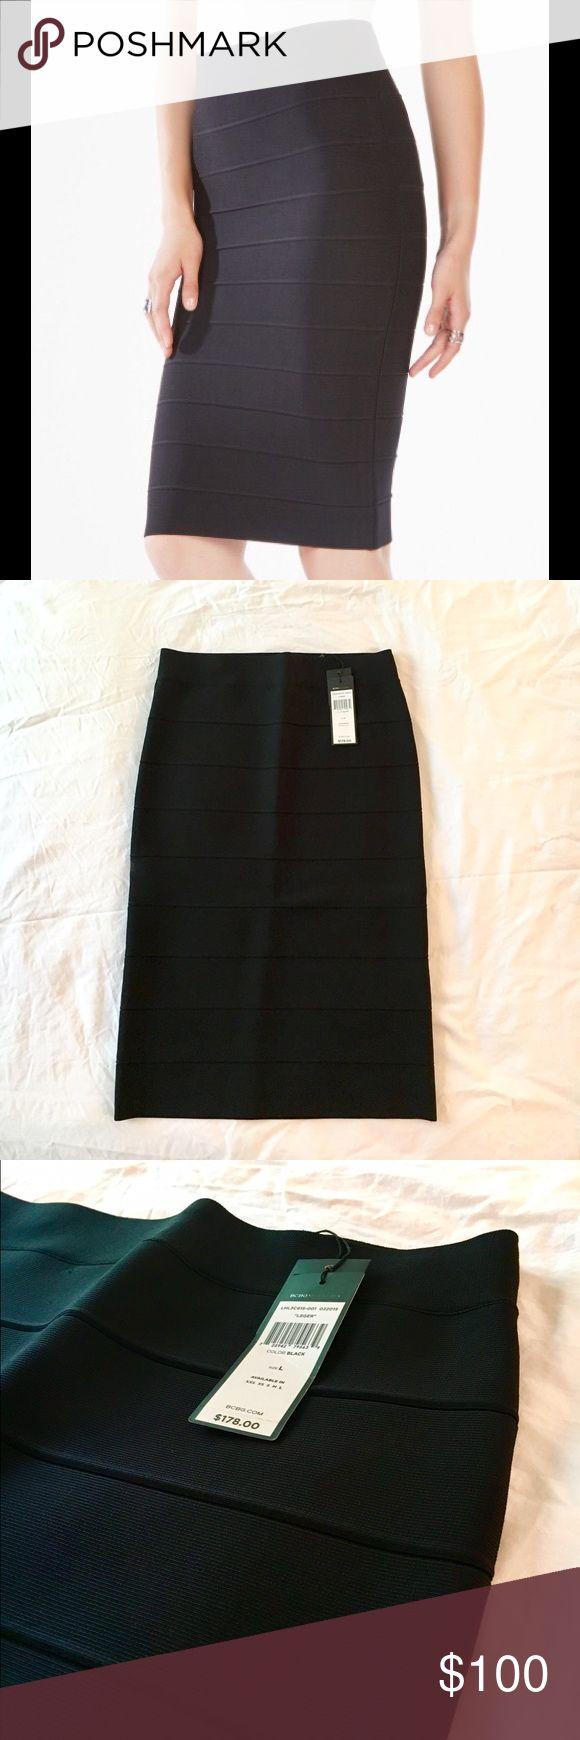 BCBGMAXAZRIA High-Waist Bandage Skirt BCBGMAXAZRIA bandage high-waist skirt has never been worn and still had tags attached. BCBG Skirts Midi